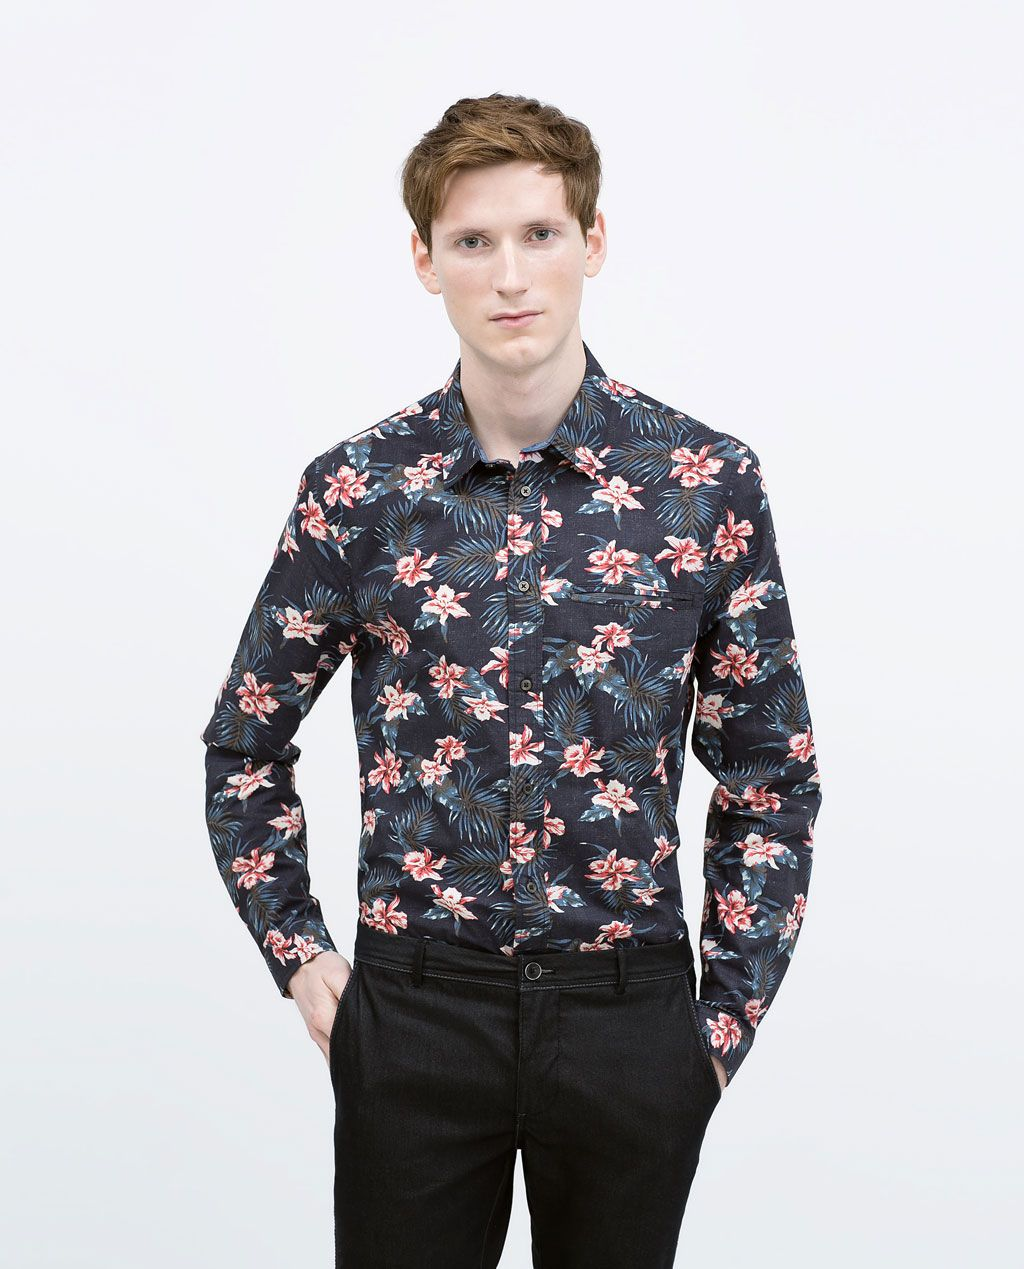 d7304d7b9c0e FLORAL PRINT SHIRT-Printed-Shirts-MAN